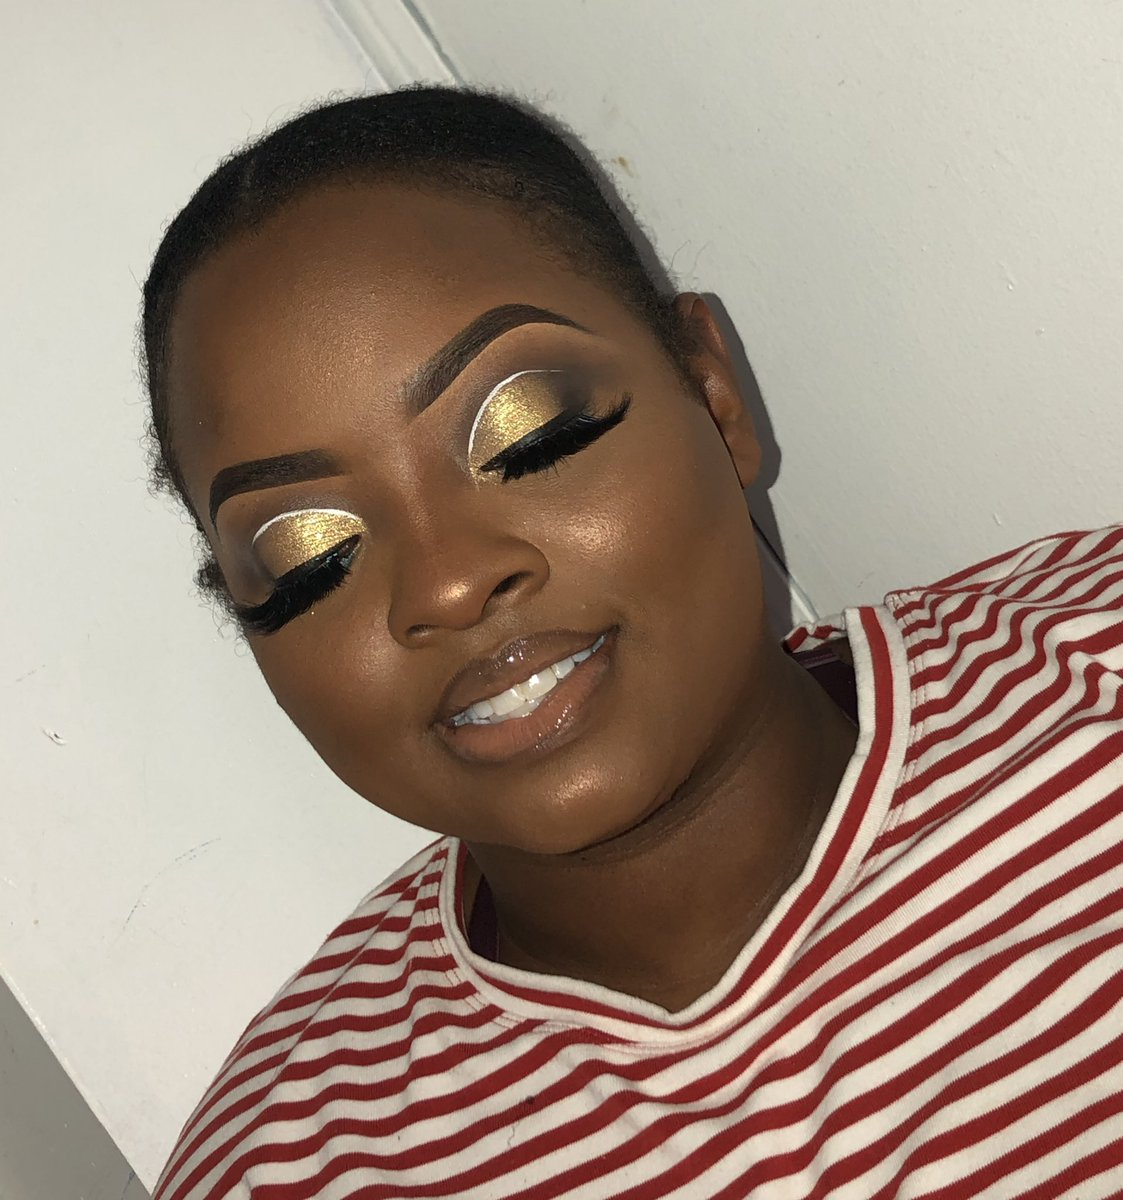 http://www.makeupbyashli.as.me   𝐍𝐎𝐕𝐄𝐌𝐁𝐄𝐑 𝐂𝐀𝐋𝐄𝐍𝐃𝐀𝐑 𝐈𝐒 𝐎𝐏𝐄𝐍#newyorkmua #nymakeupartist #makeupbyashli #newyorkmakeupartist #blackgirlmakeup #makeupformelaningirlspic.twitter.com/5mZoPe2HZb